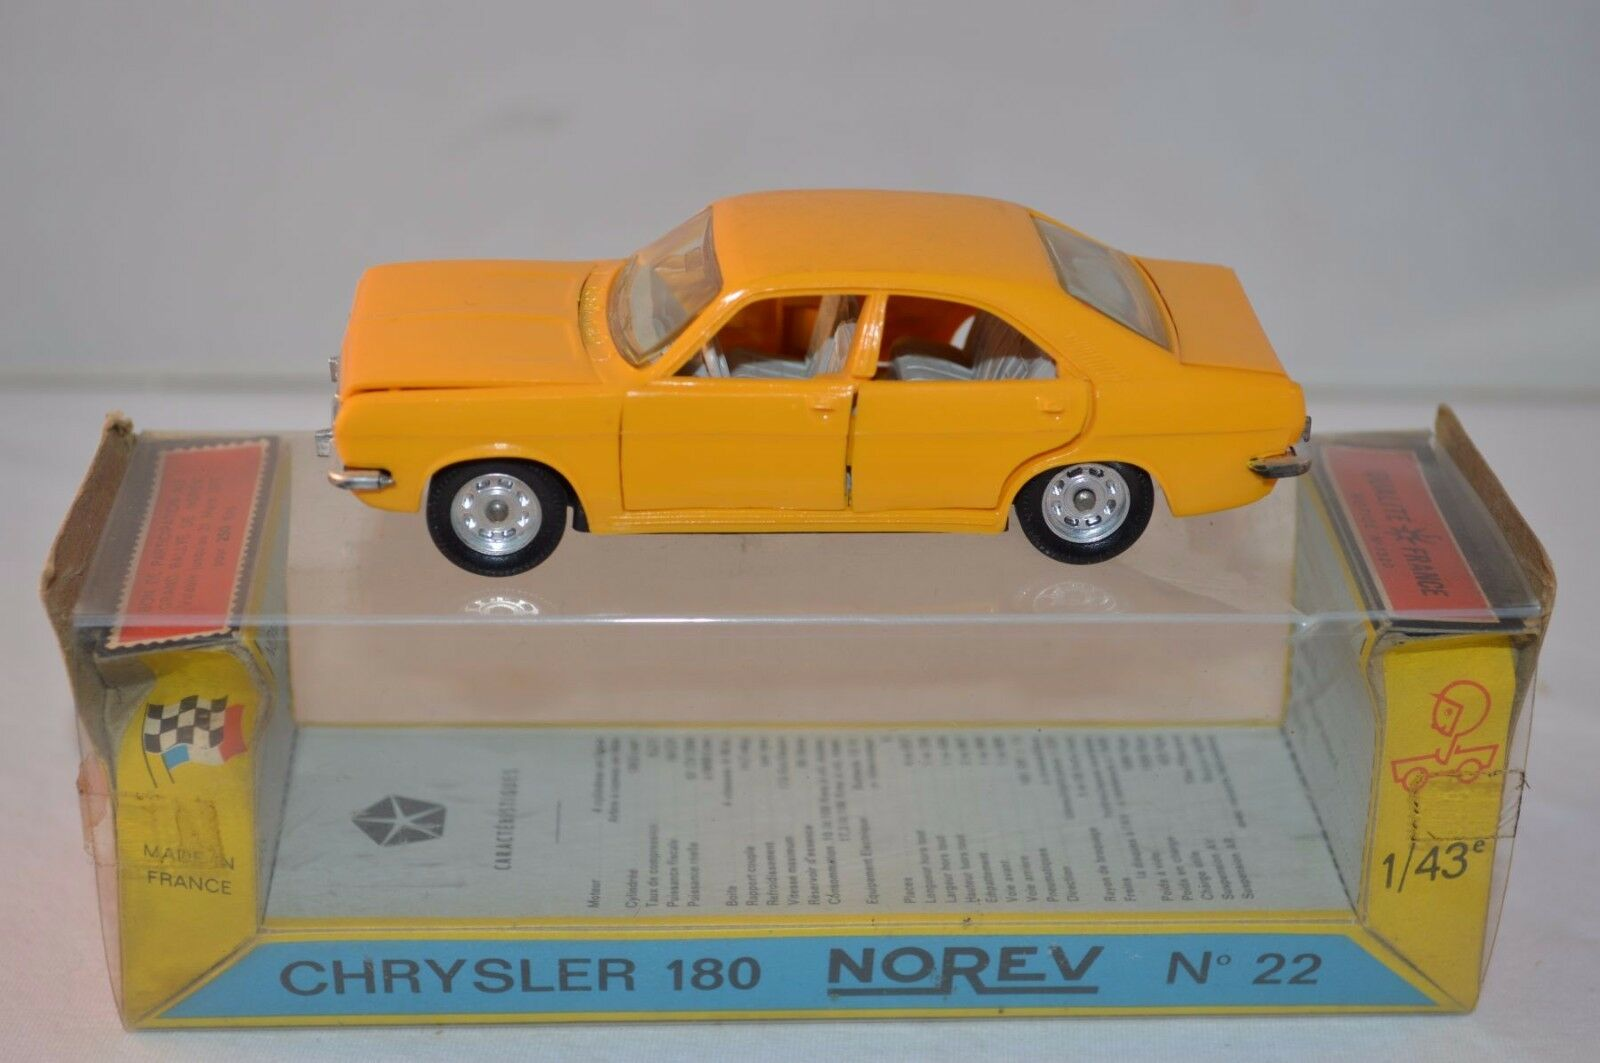 Norev 22 Chrysler 180 Plastique very very near mint in box RARE Selten